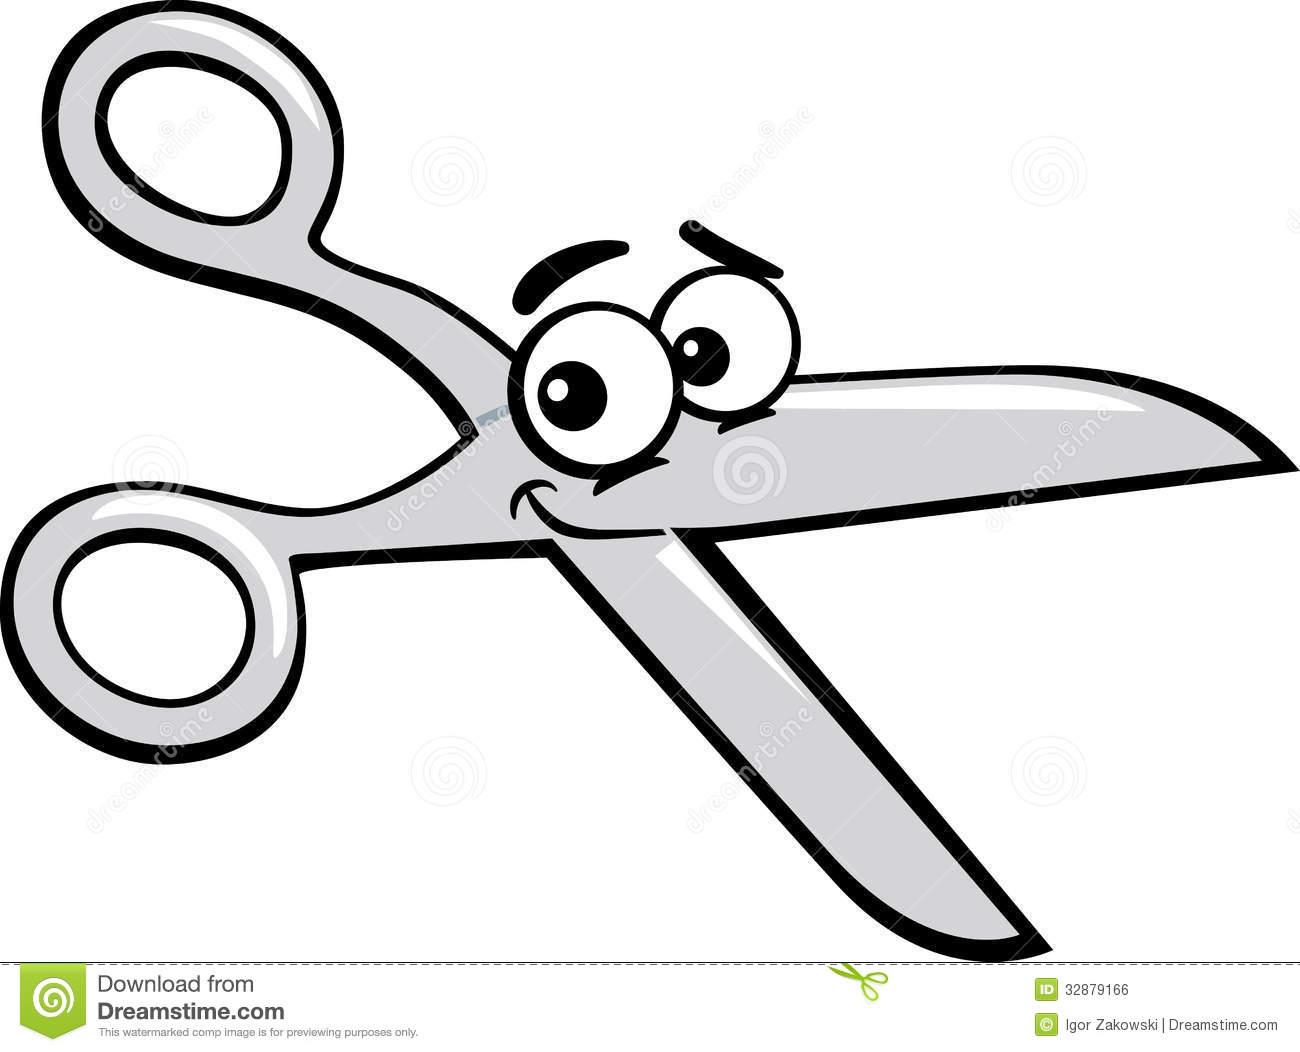 Scissors Cute Clipart - Clipart Kid